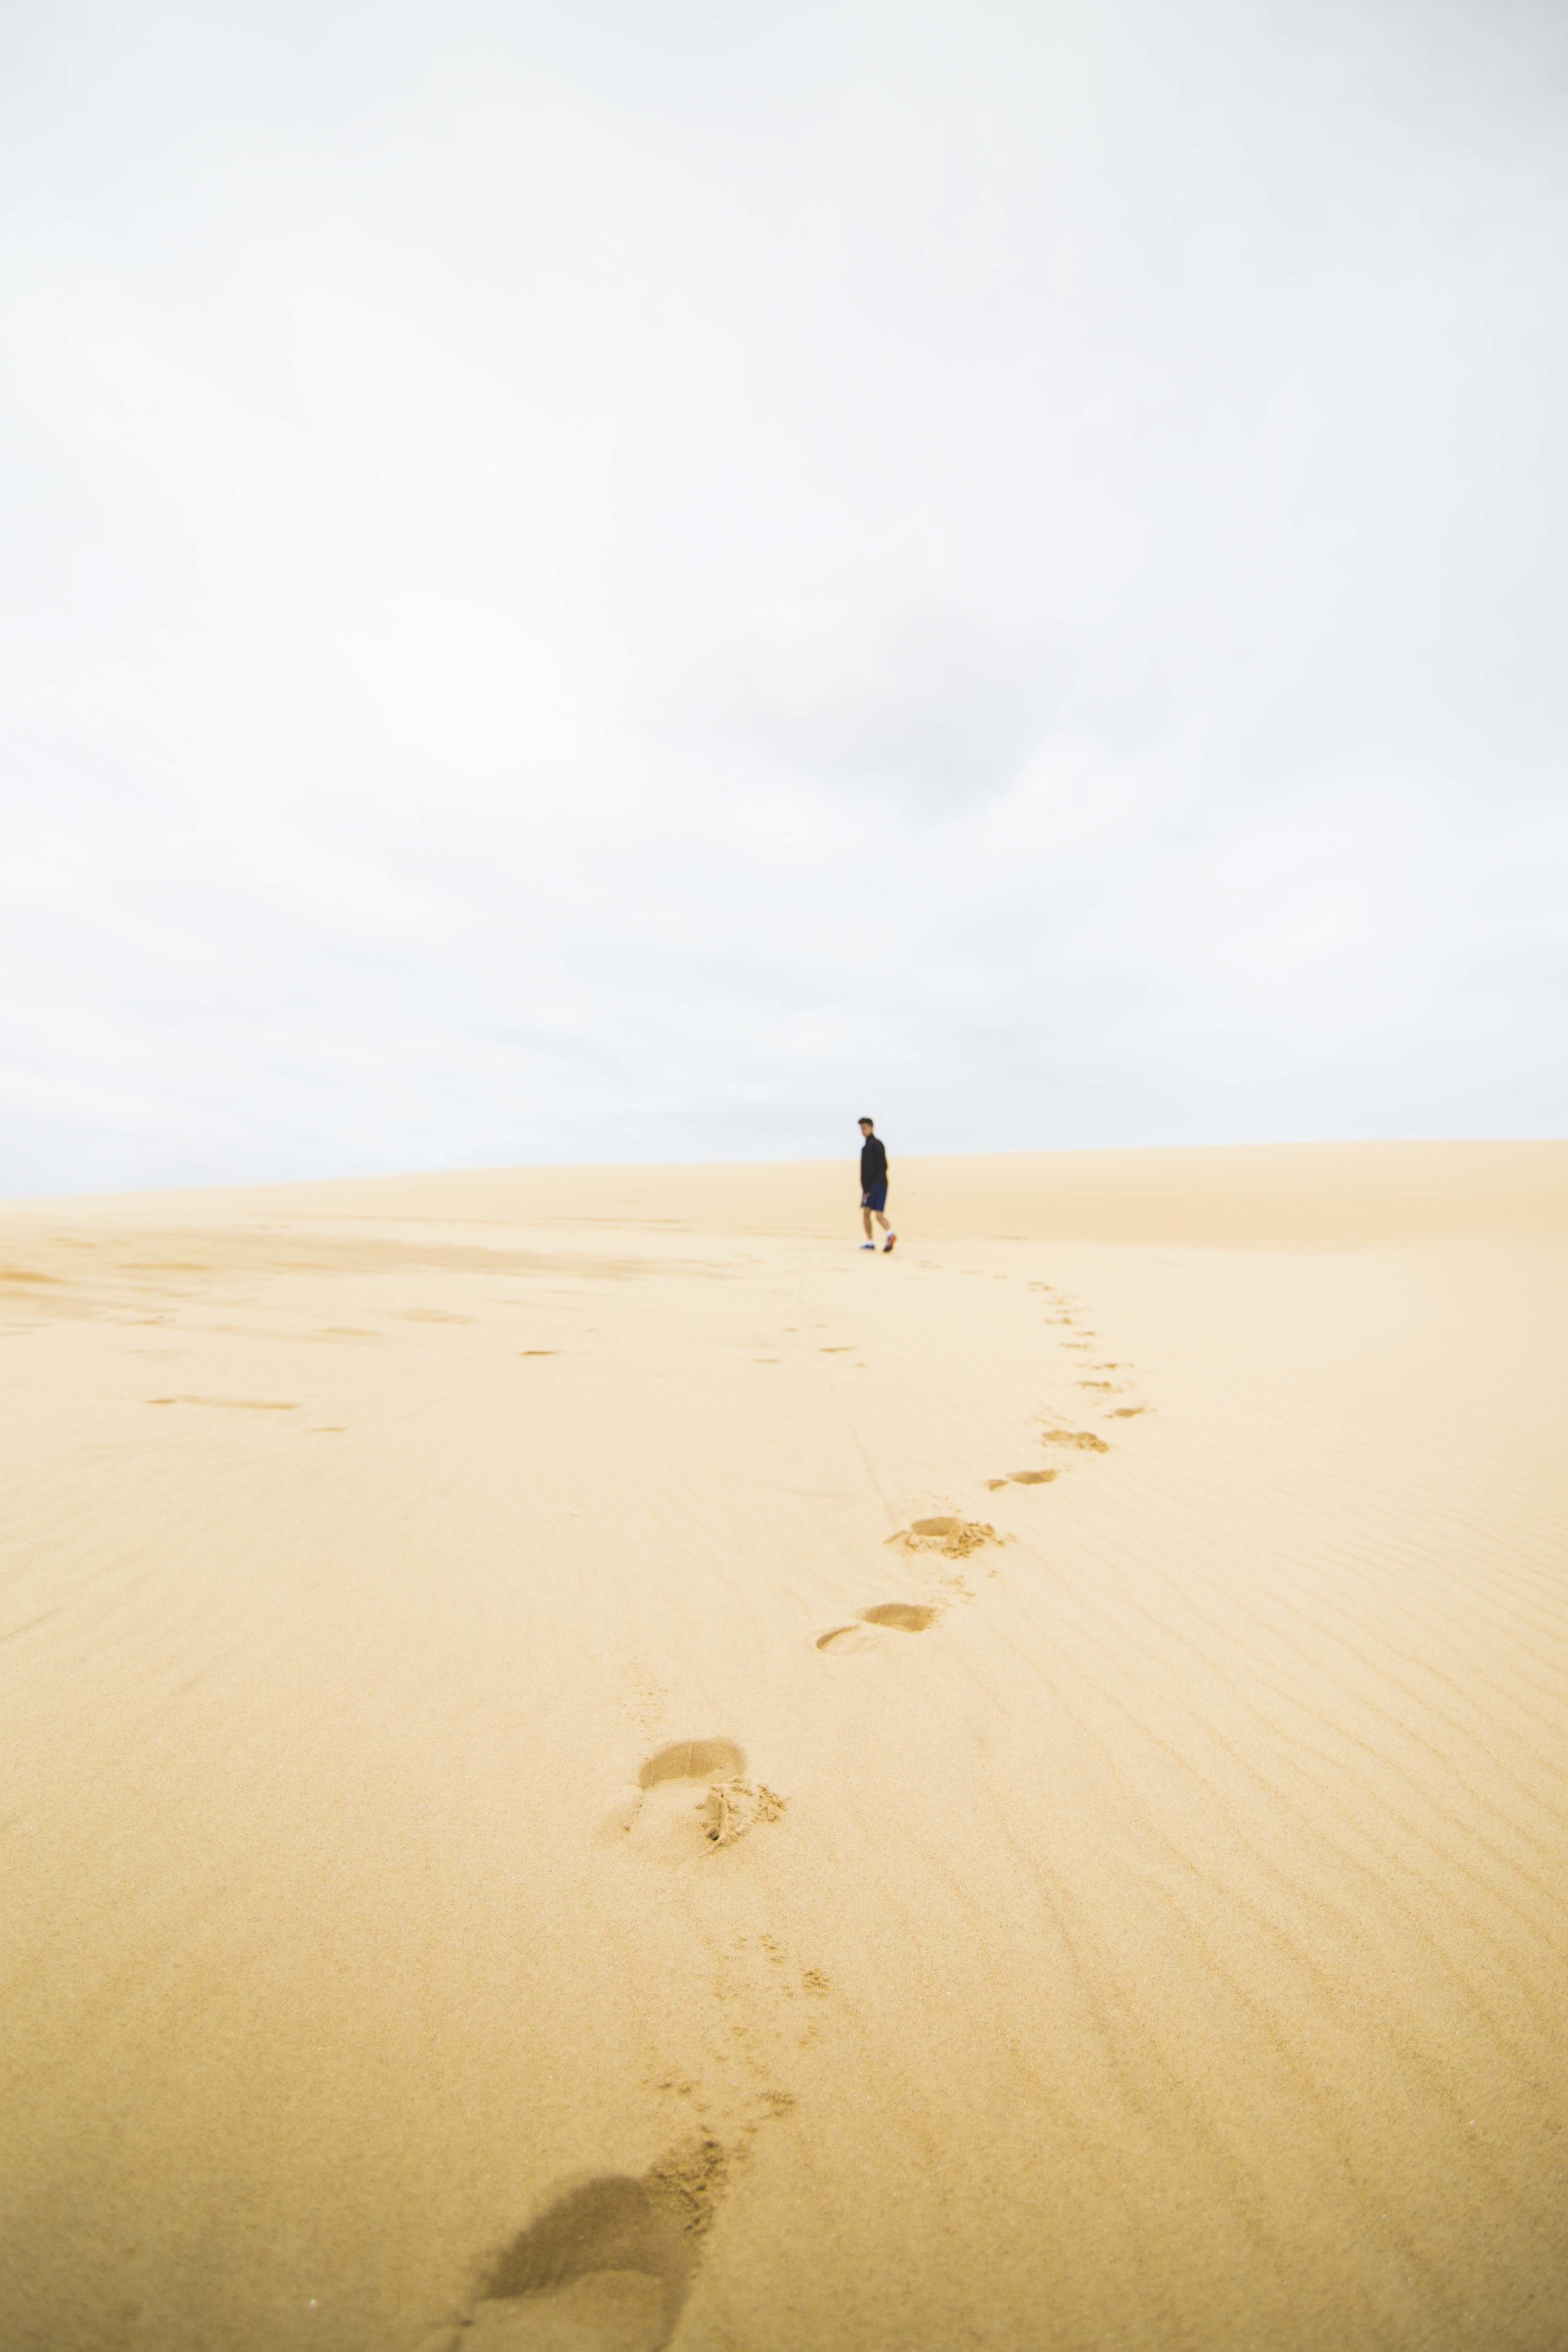 Sand Dunes near Stockton. Photo: Marine Raynard